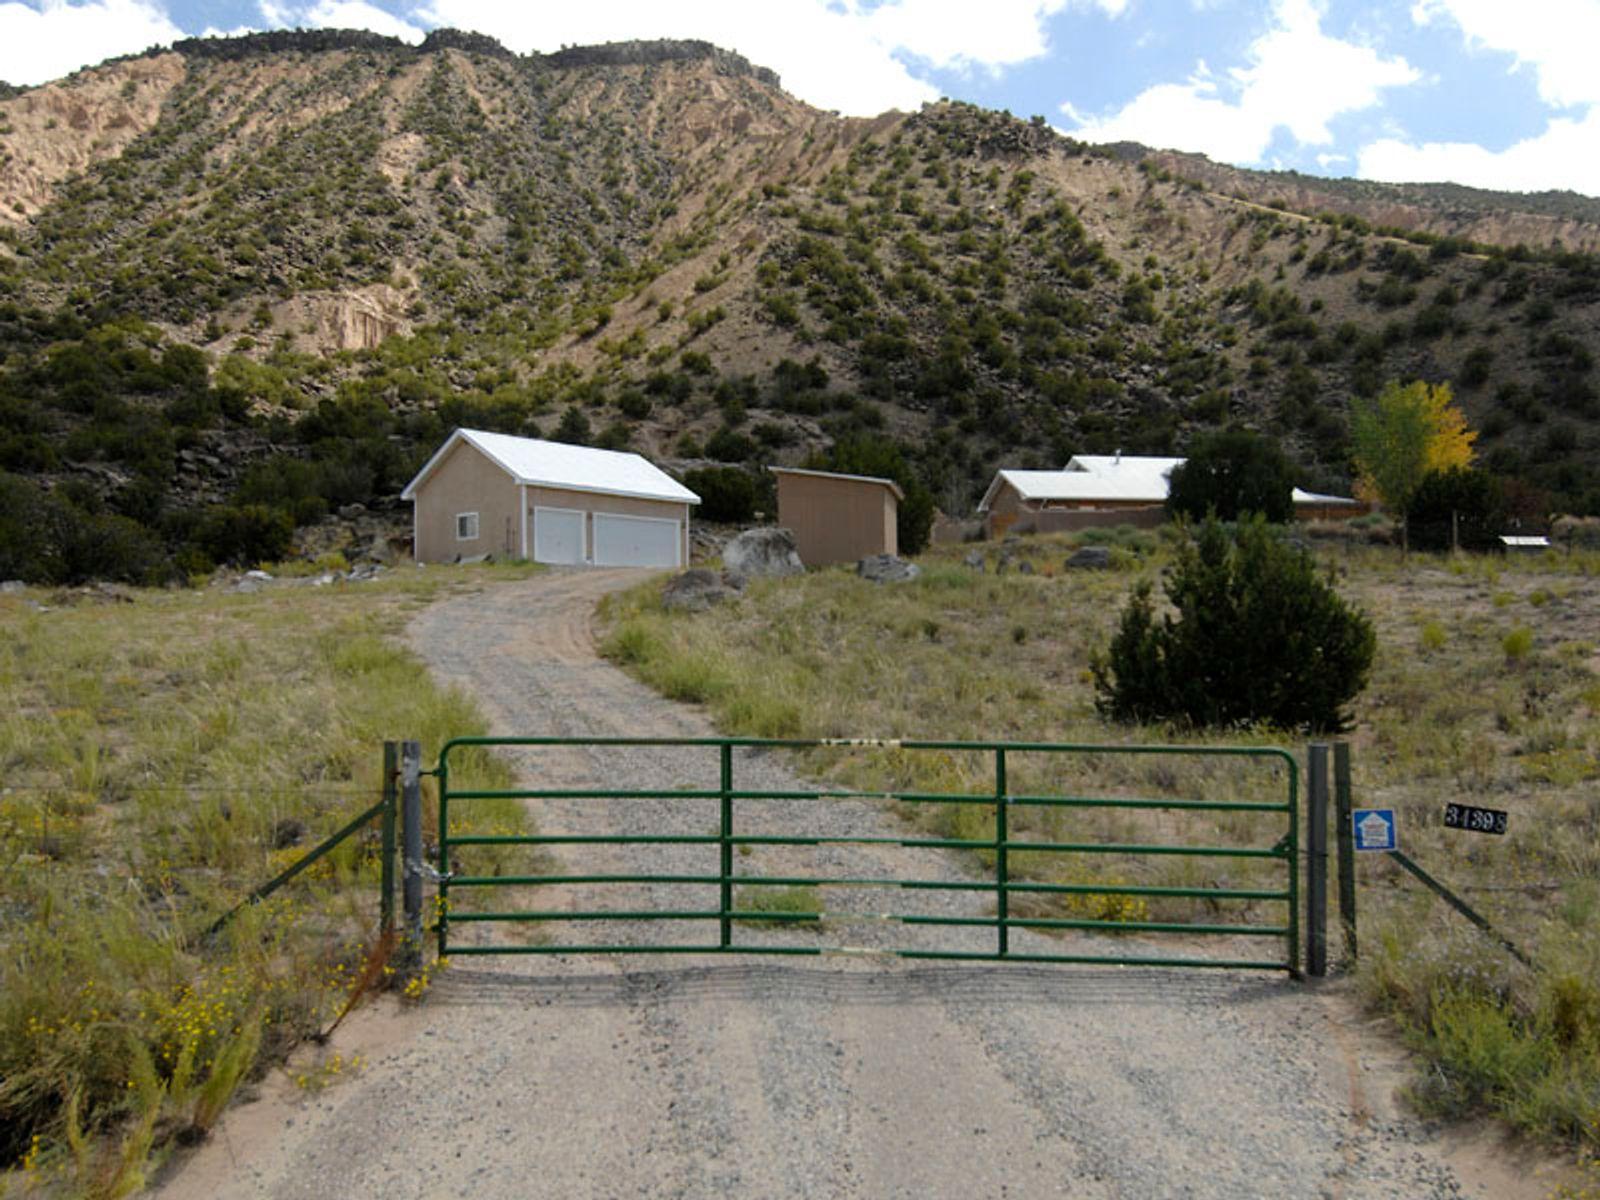 34398 U.S. Highway 285, Ojo Caliente